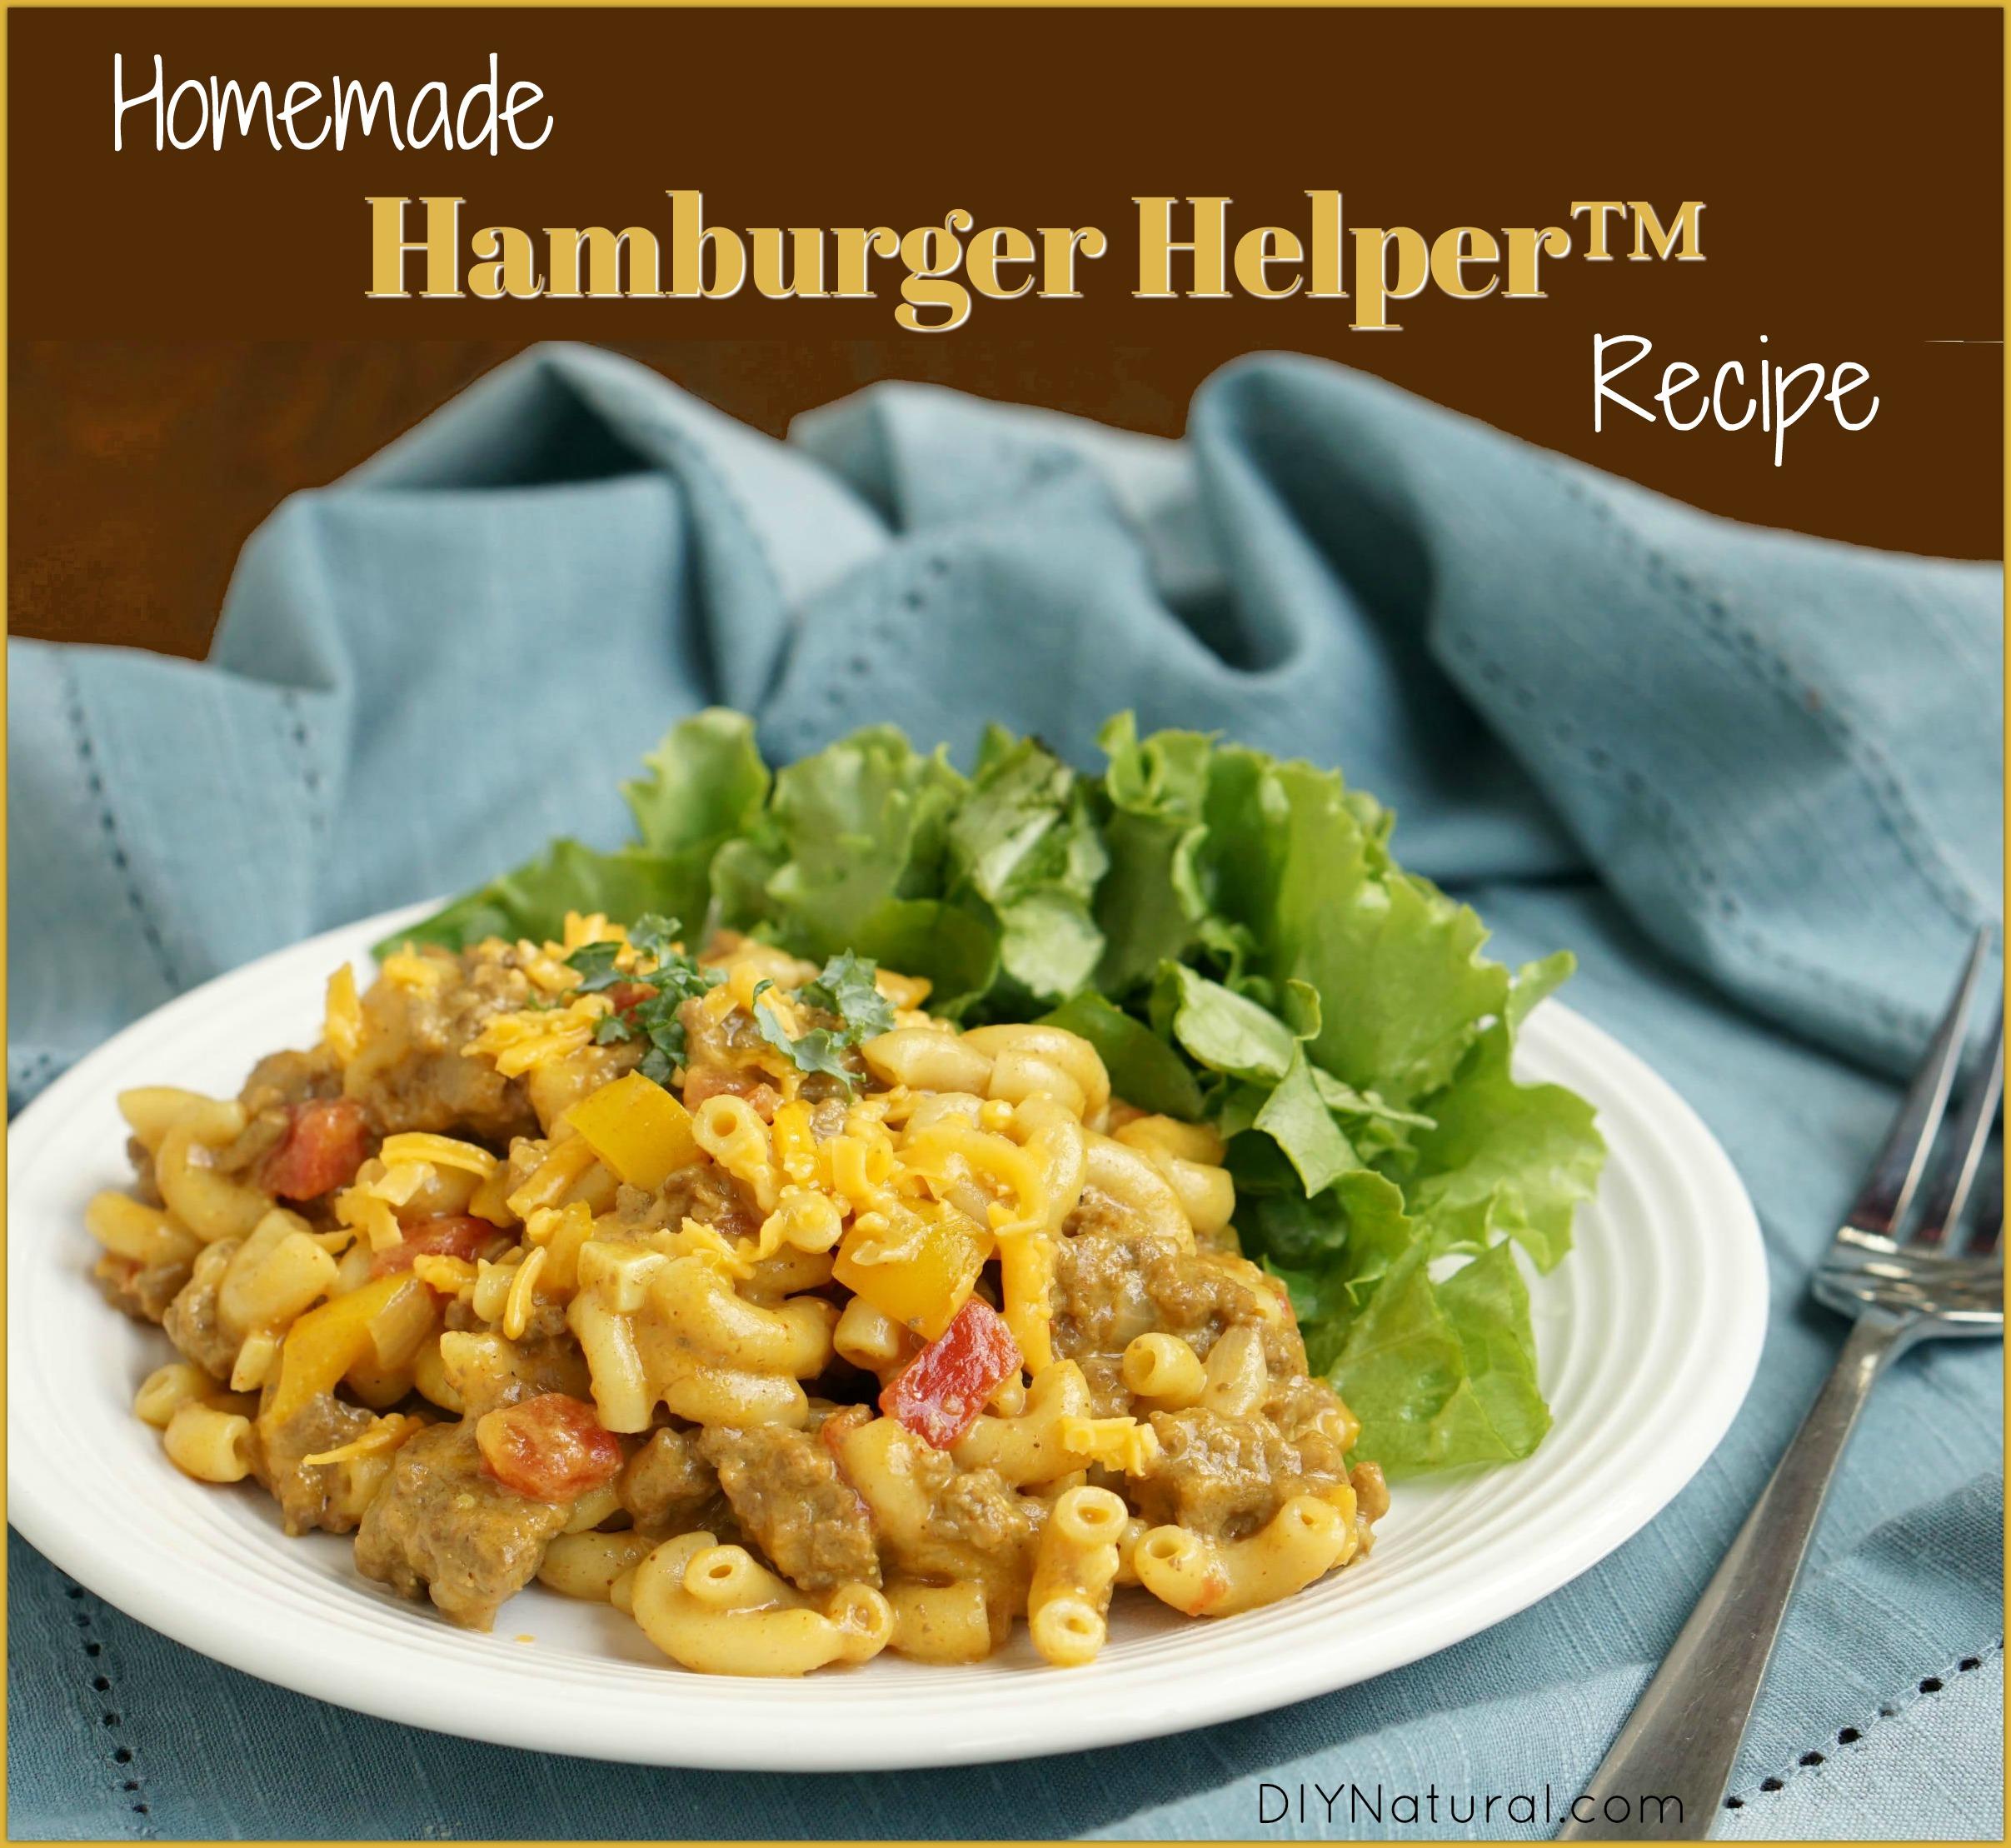 Homemade Hamburger Helper: Cheeseburger